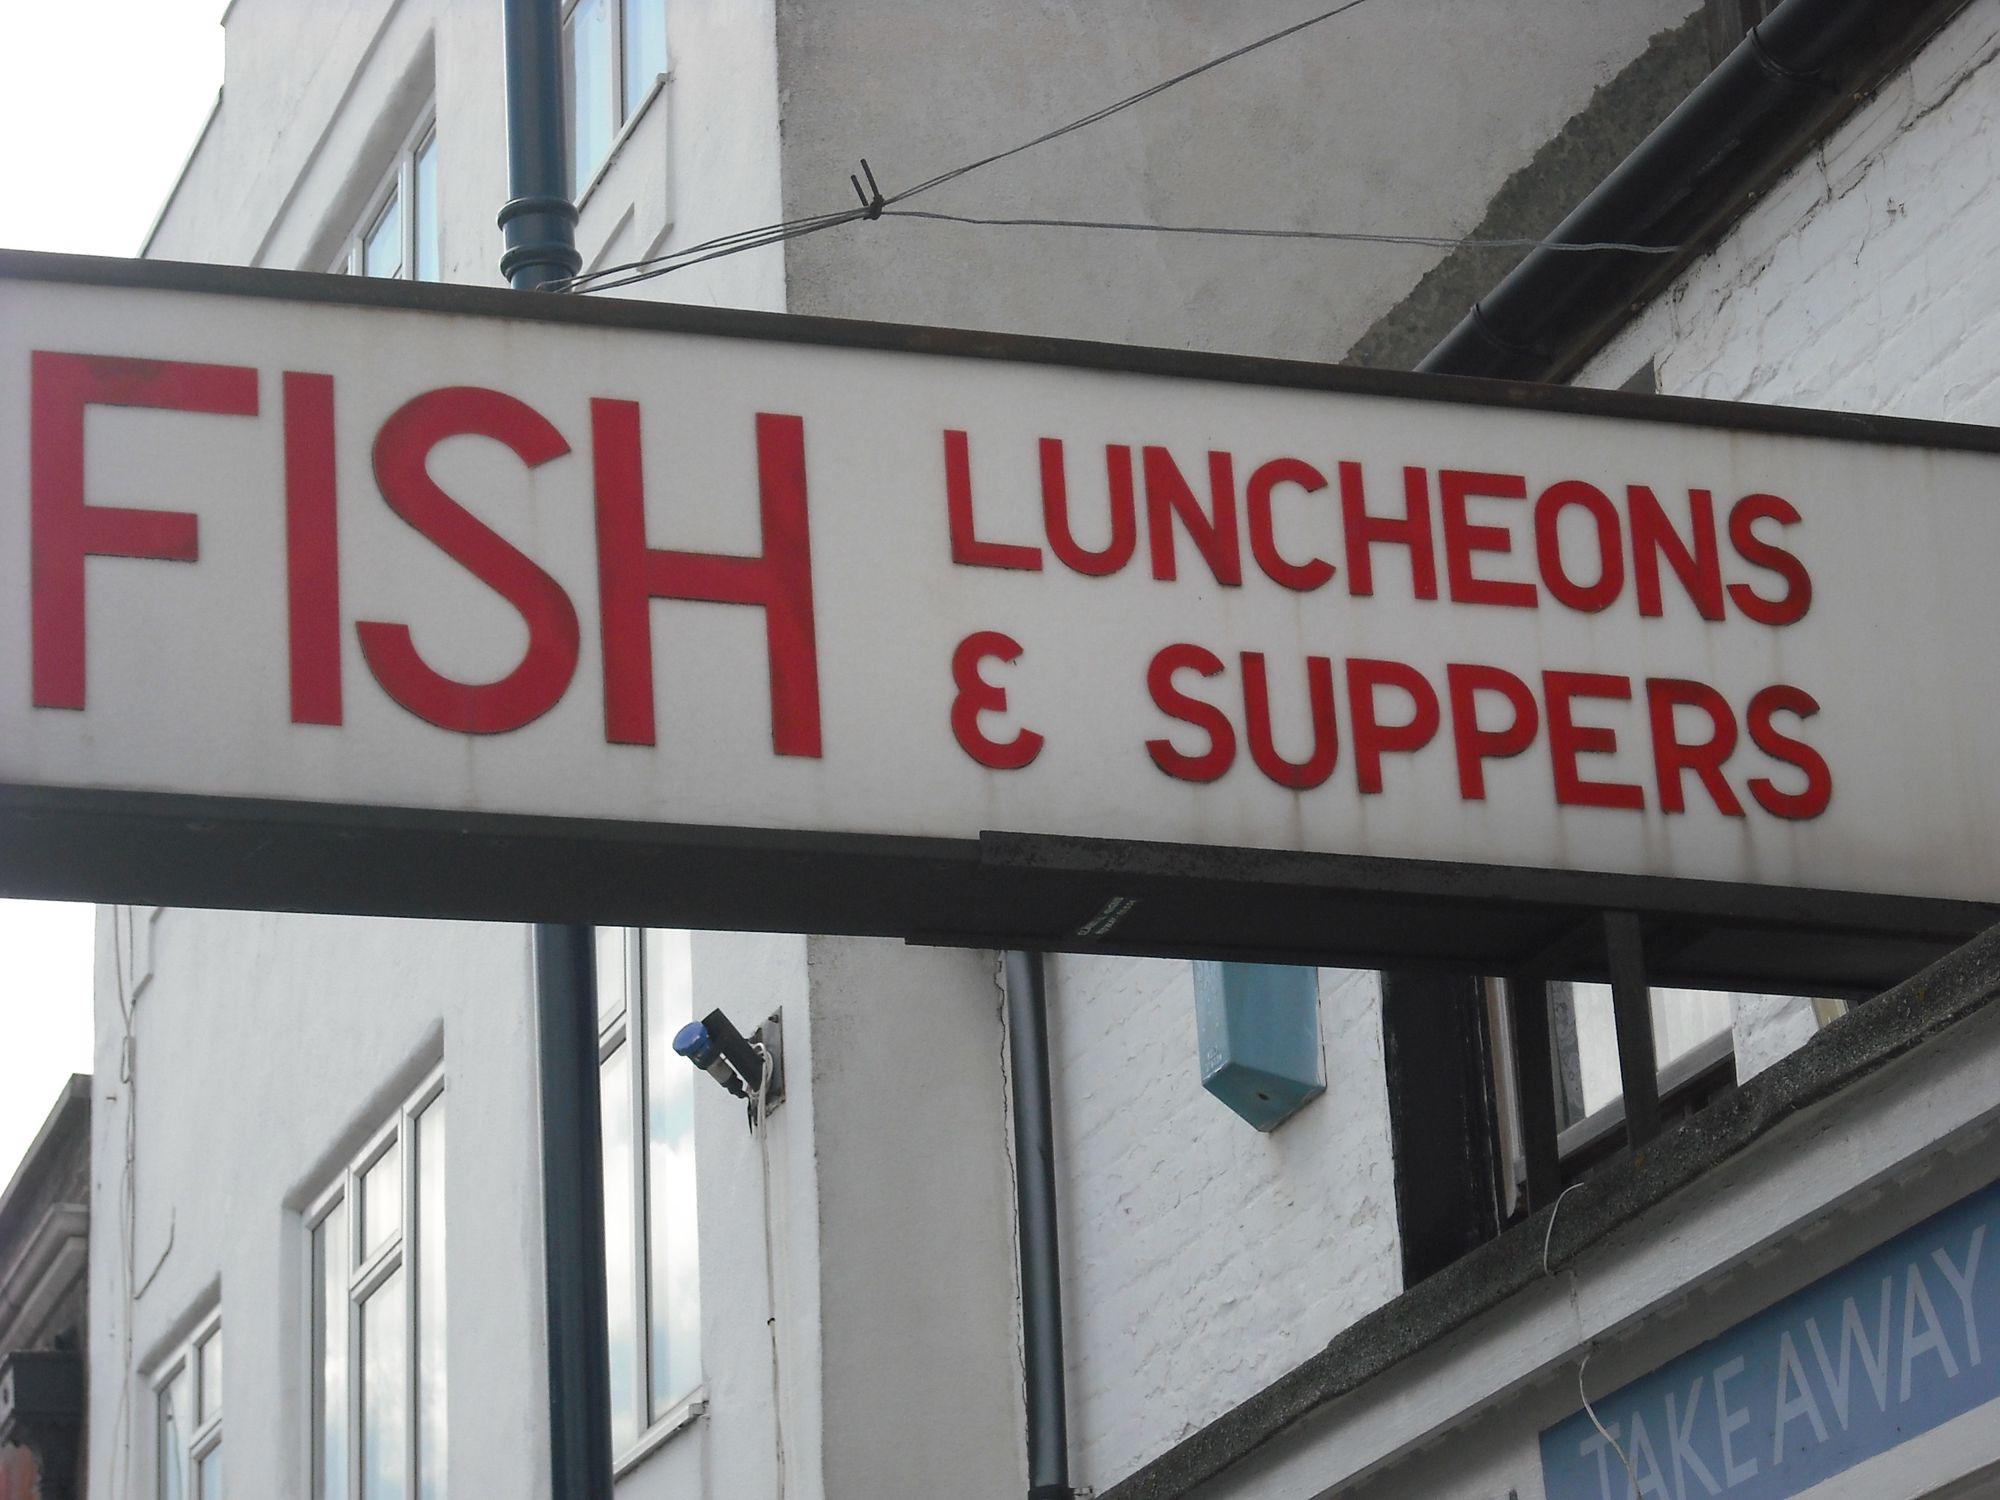 VC Jones Fish & Chips